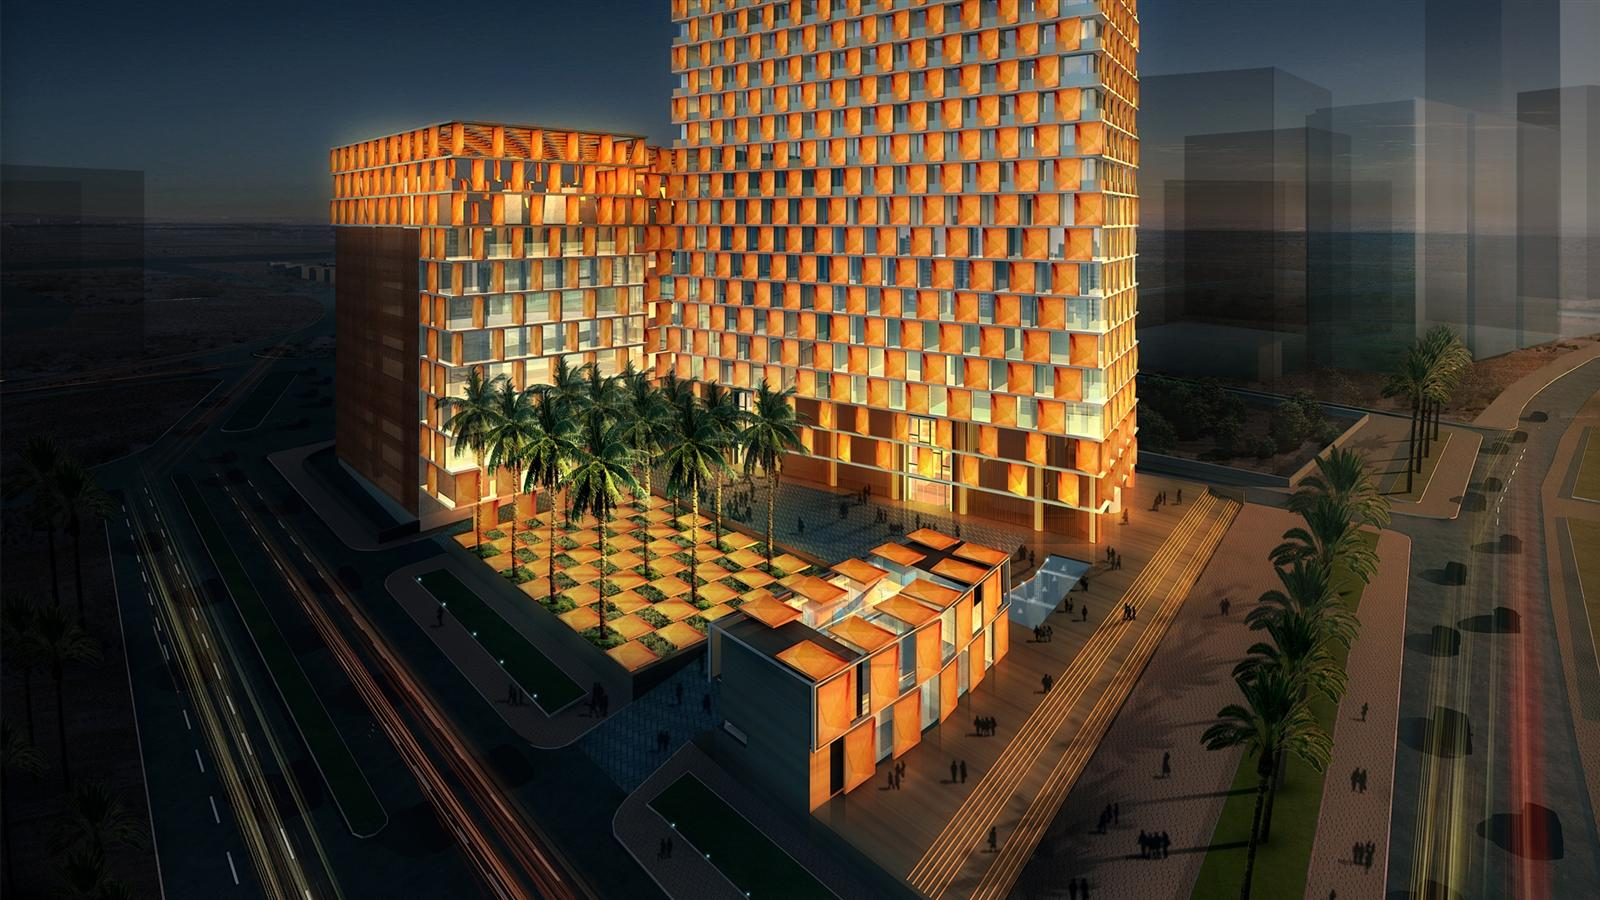 Shangri-La Hotel Project - Jeddah